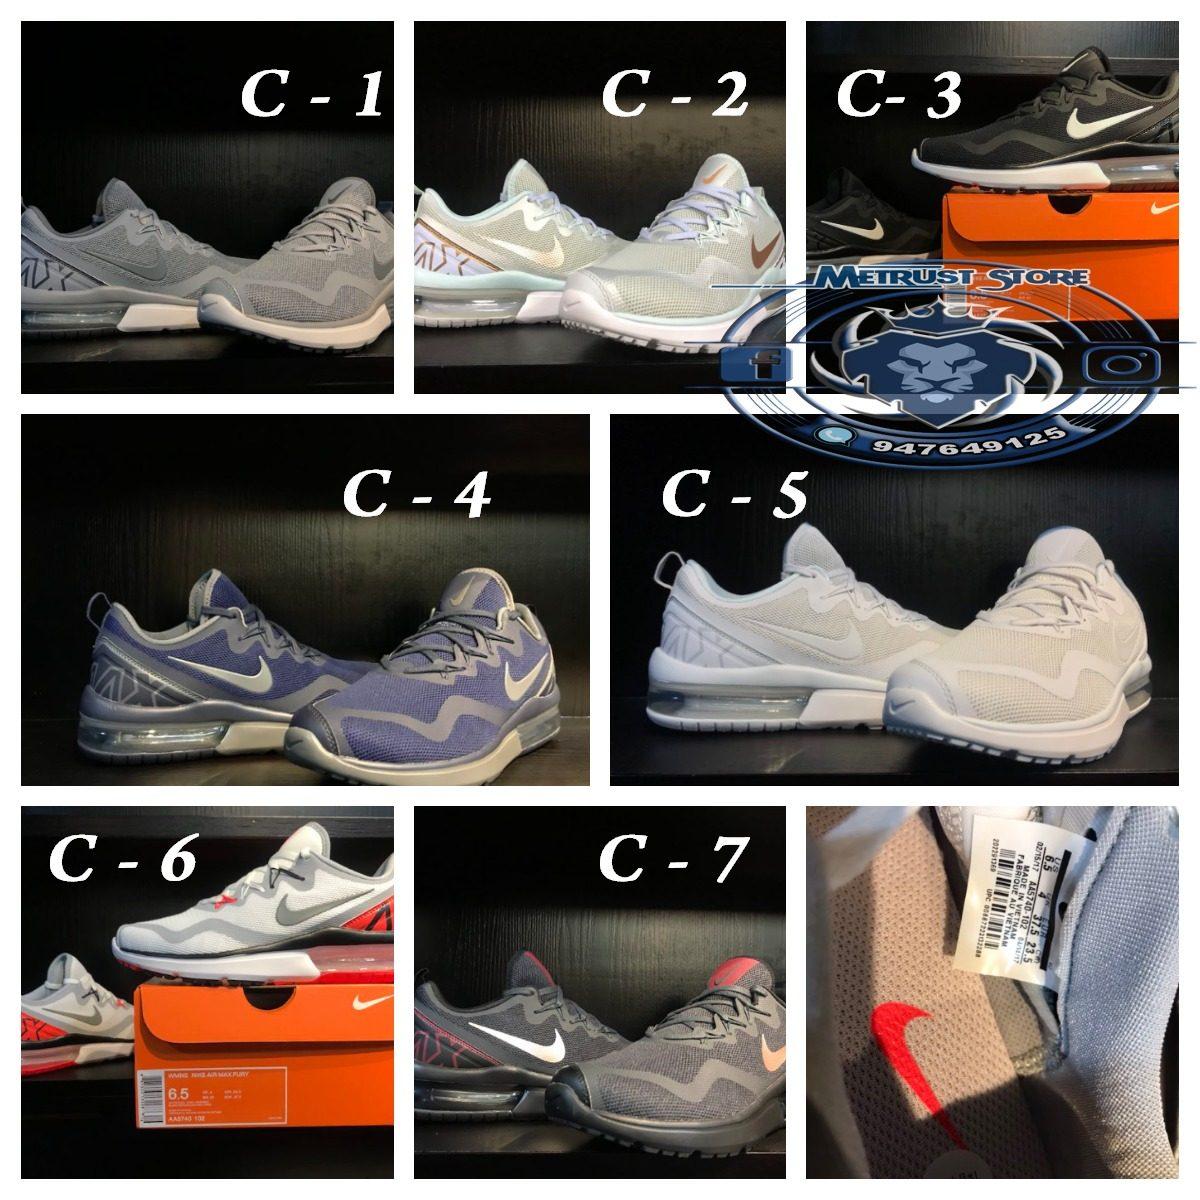 premium selection 2a6ee bbcec Nike Air Max Fury 2017